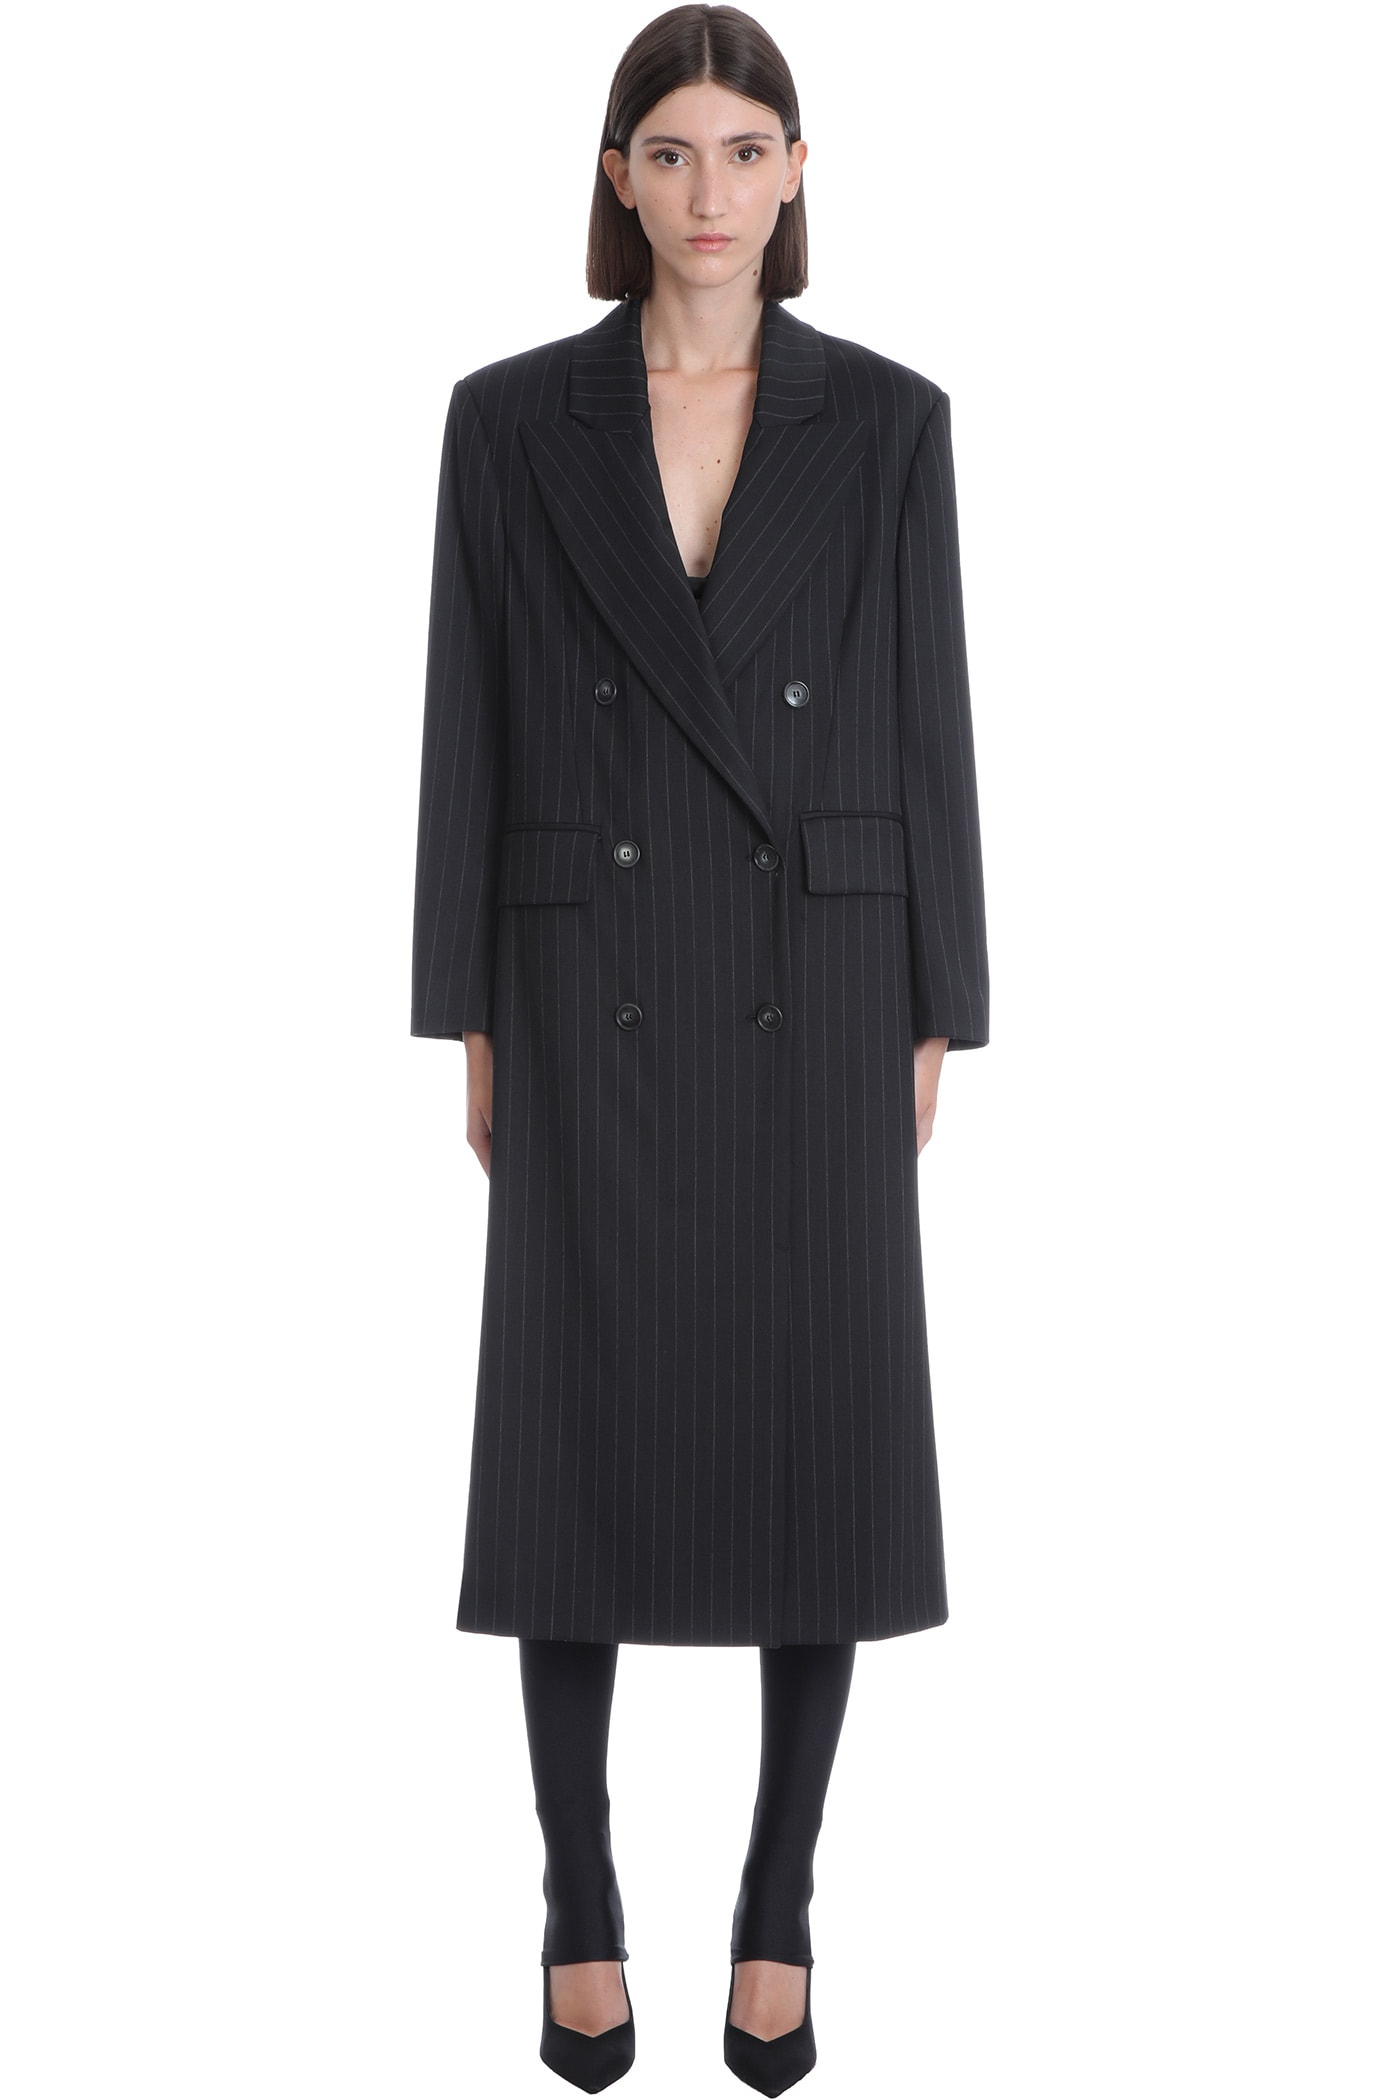 Halston Coat In Black Wool